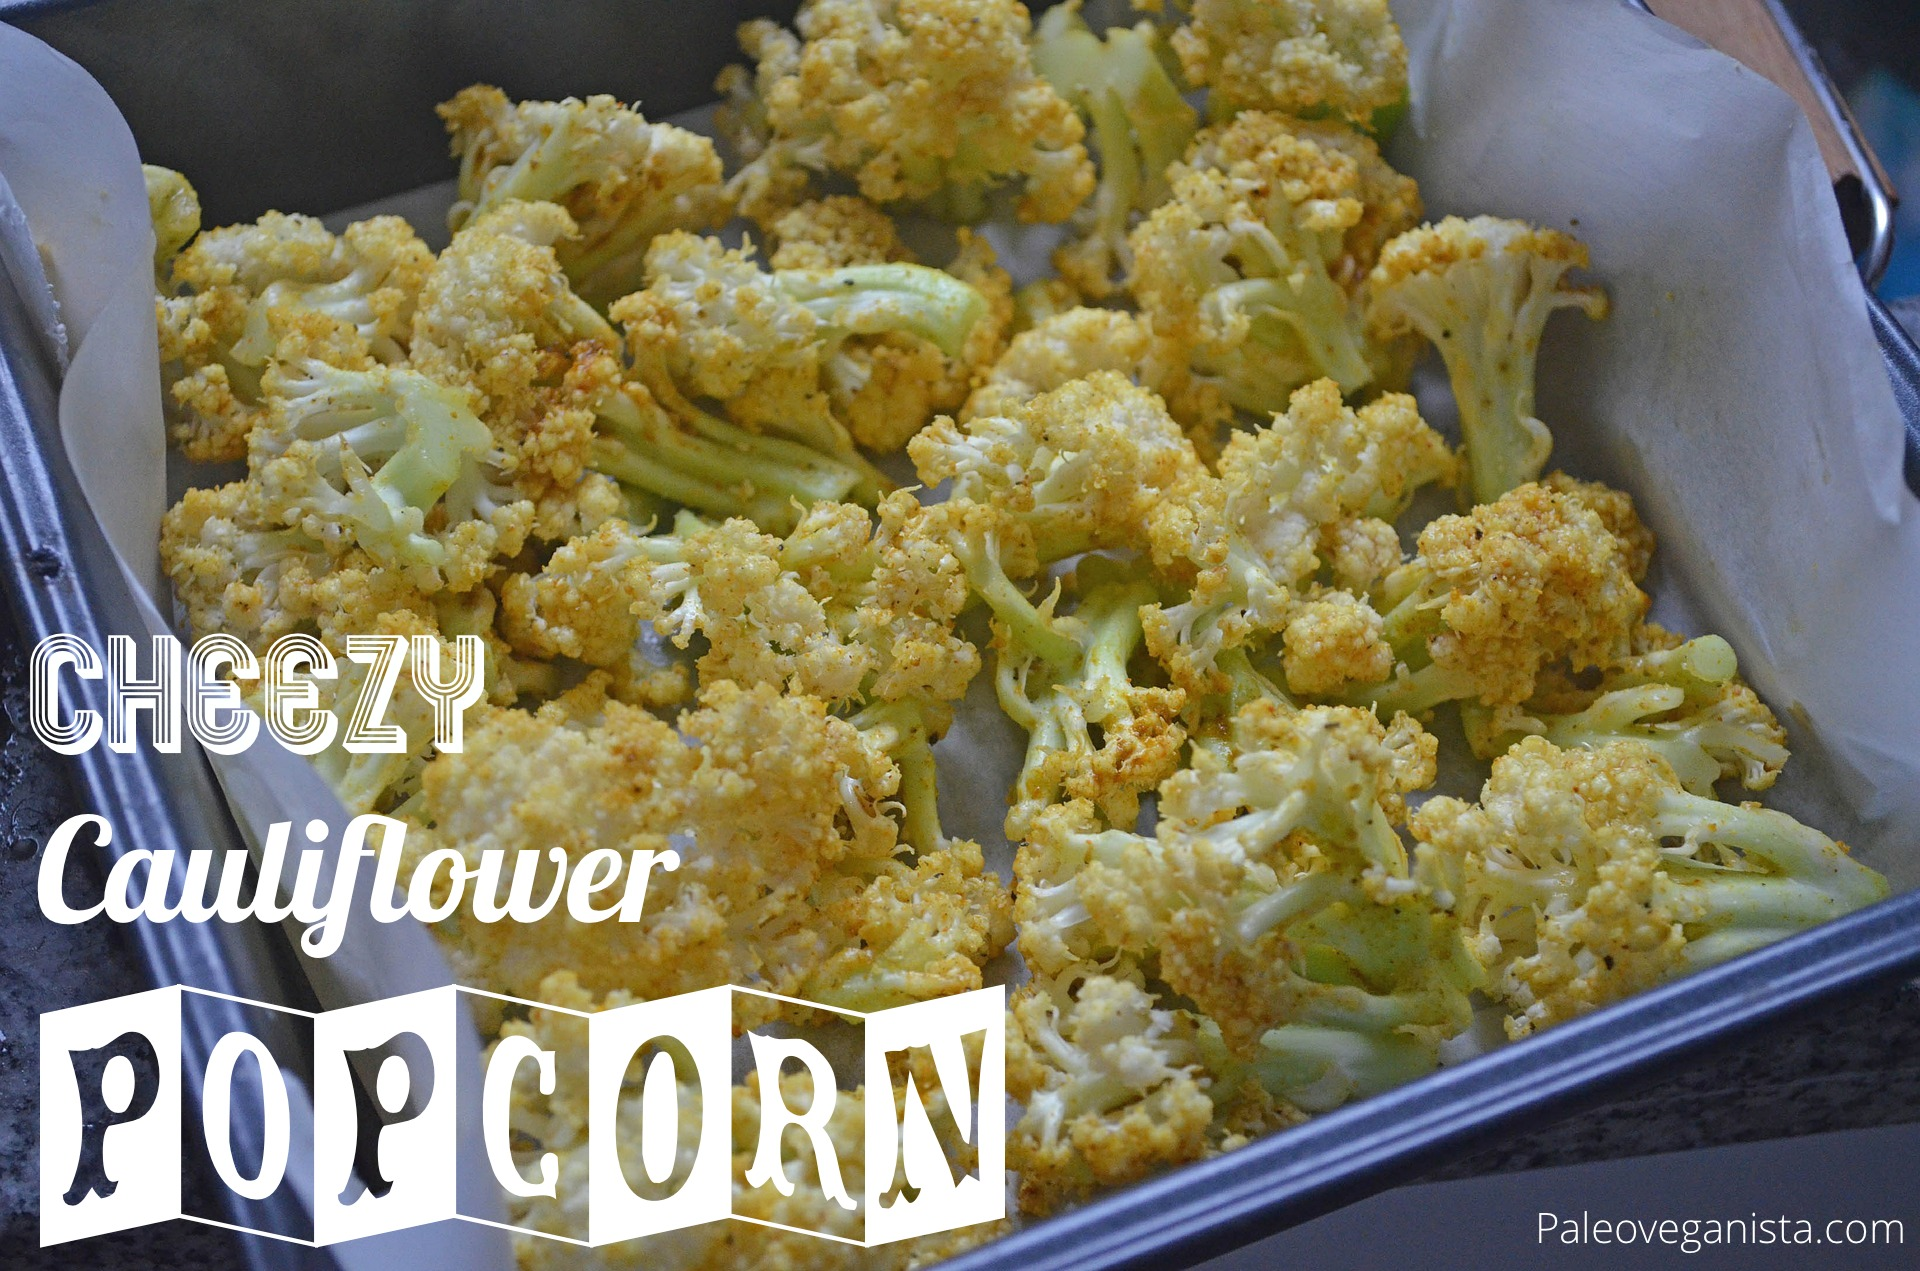 cheezy-cauliflower-popcorn-paleoveganista